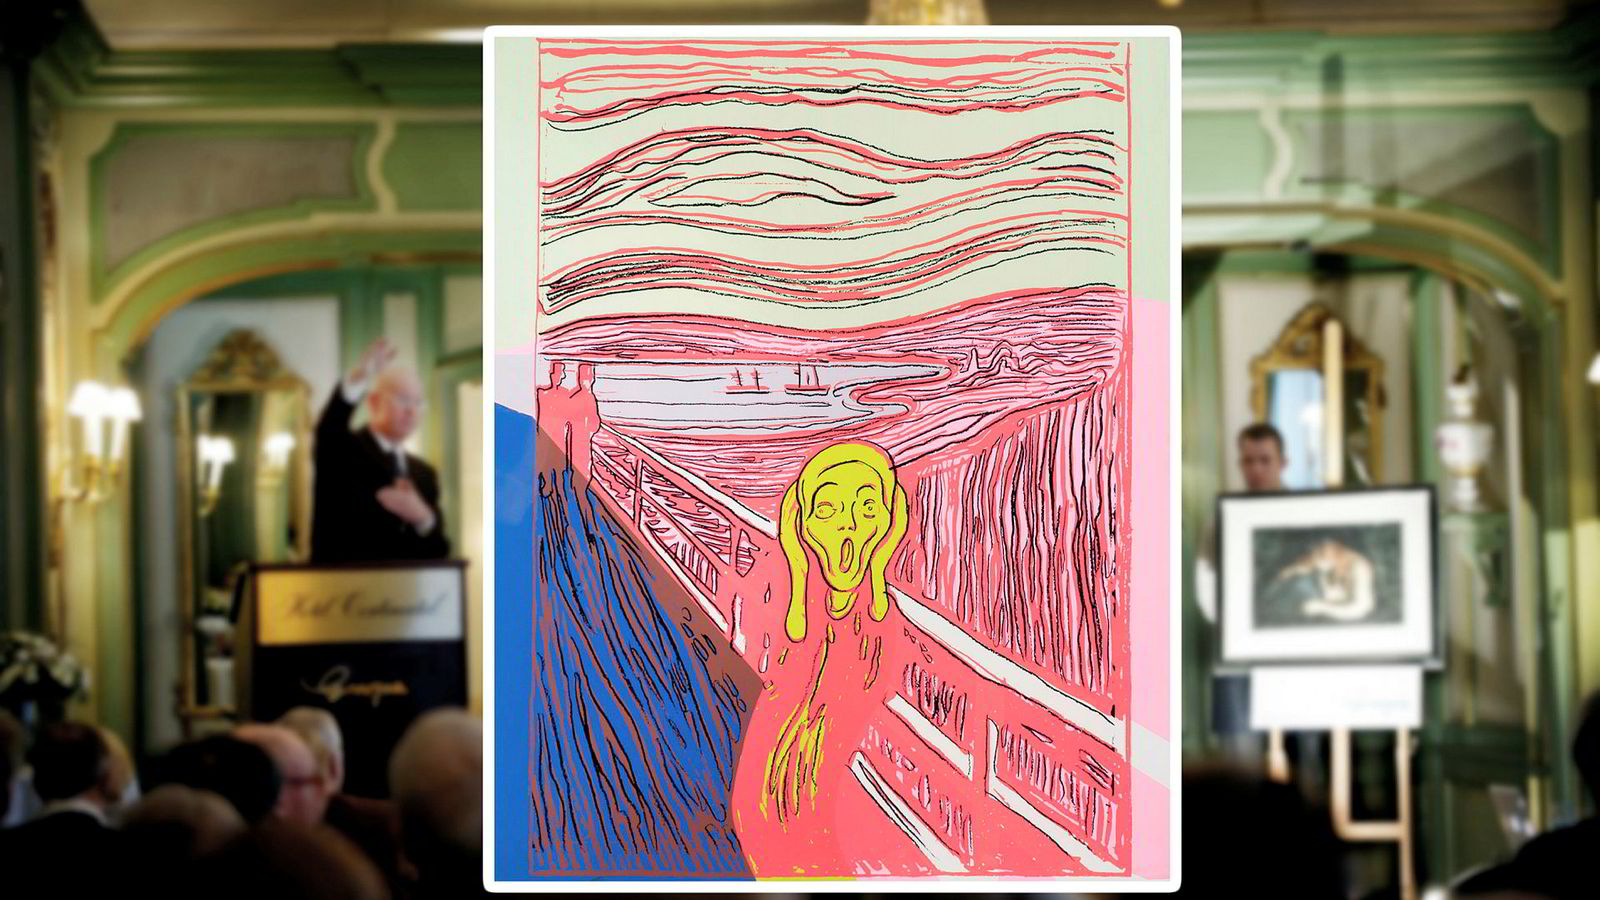 Einar Aas solgte et Andy Warhol serigrafi etter Munchs